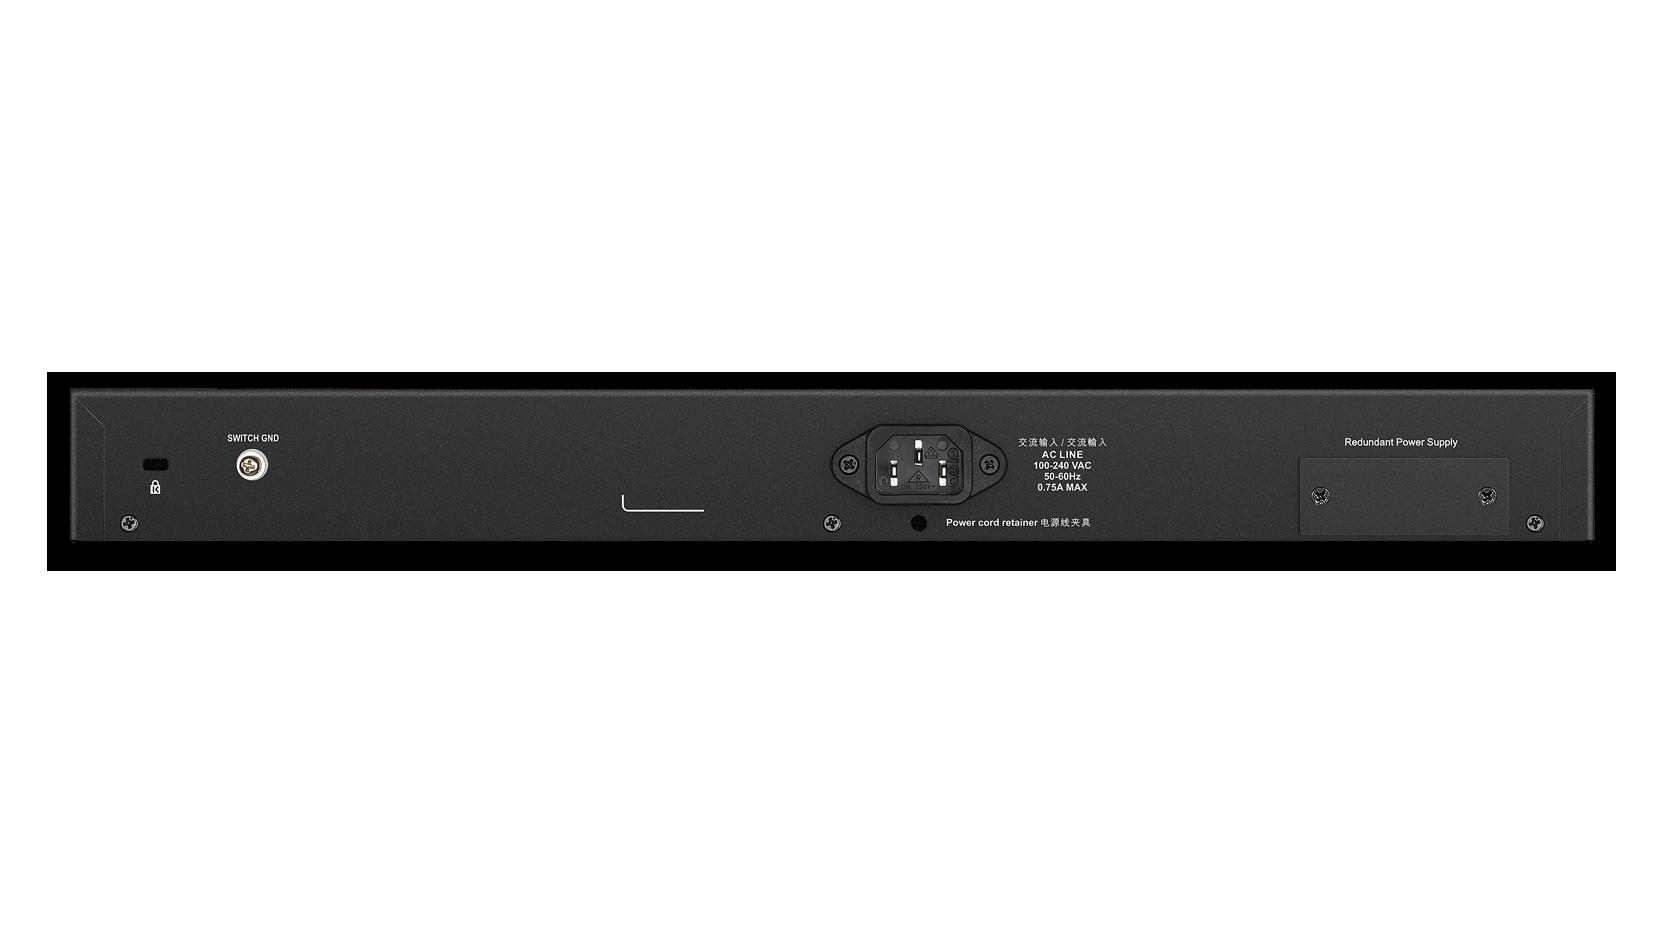 DGS-3630